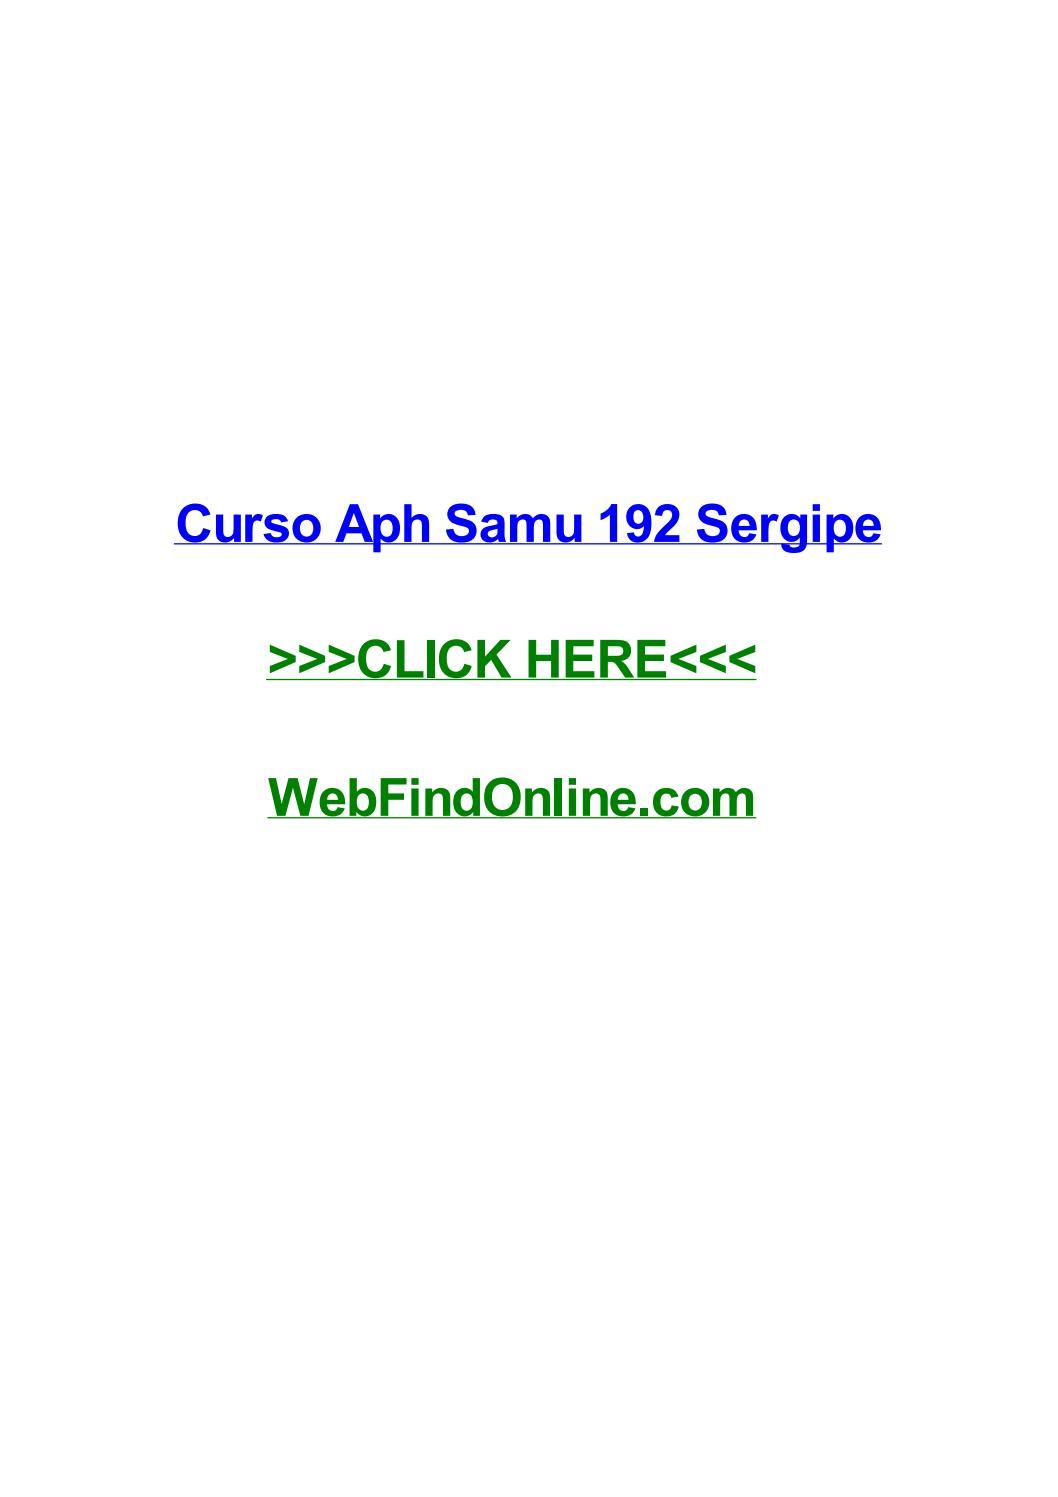 curso de aph avançado online